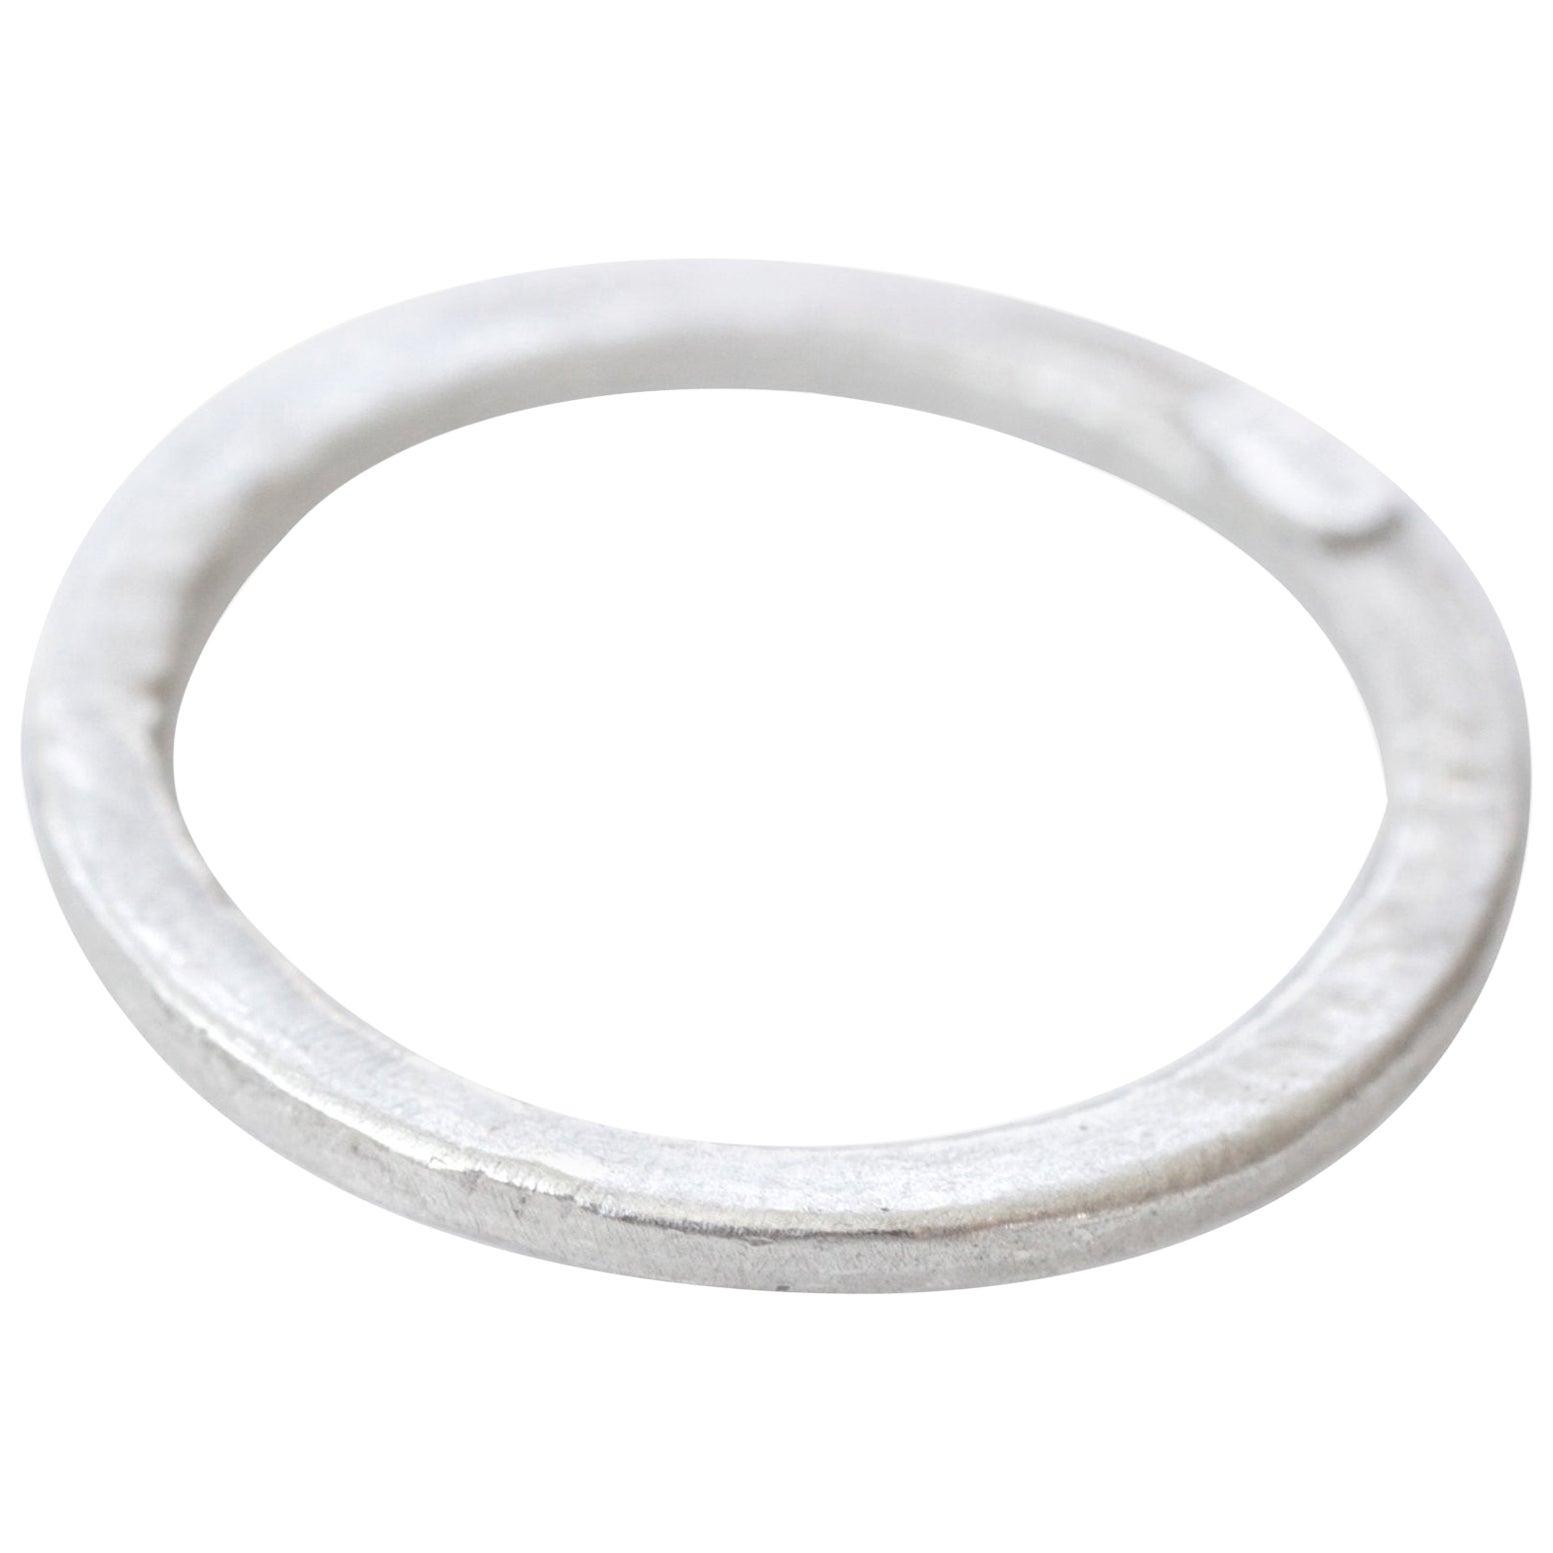 Sterling Silver Medium Band Ring Stacking Fashion Unisex Design for Men Women